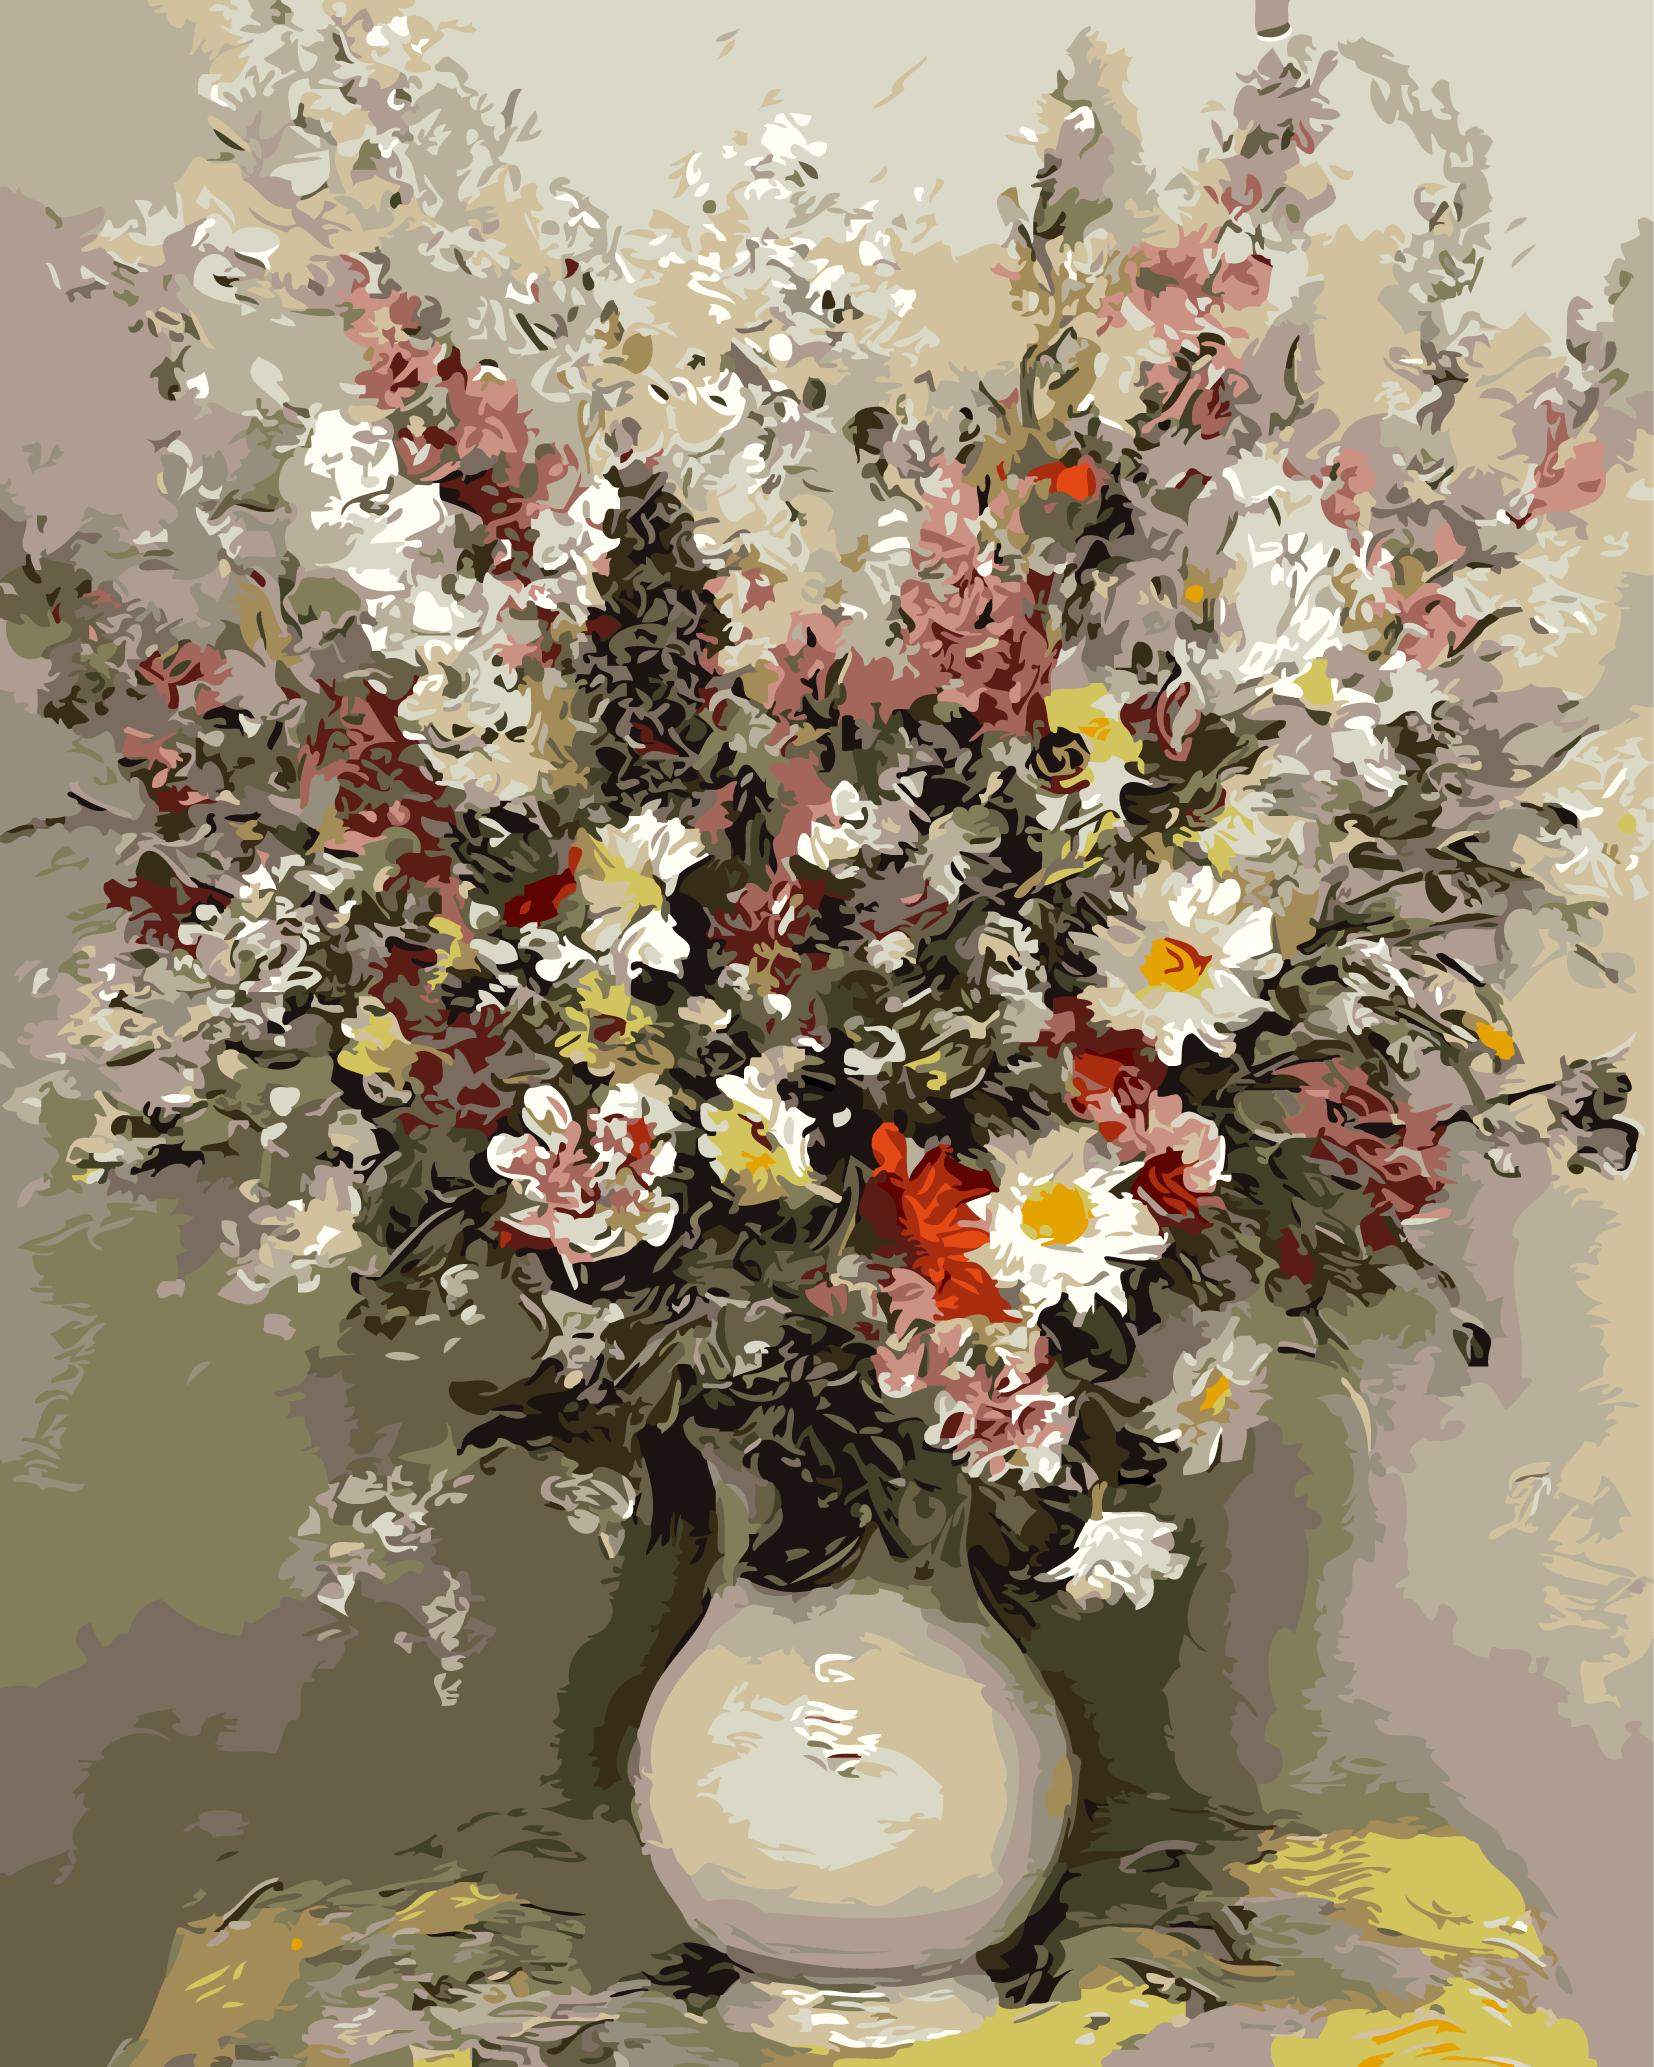 "MG762 ภาพระบายสีตามตัวเลข ""ดอกไม้หลากสีในแจกันขาว"""